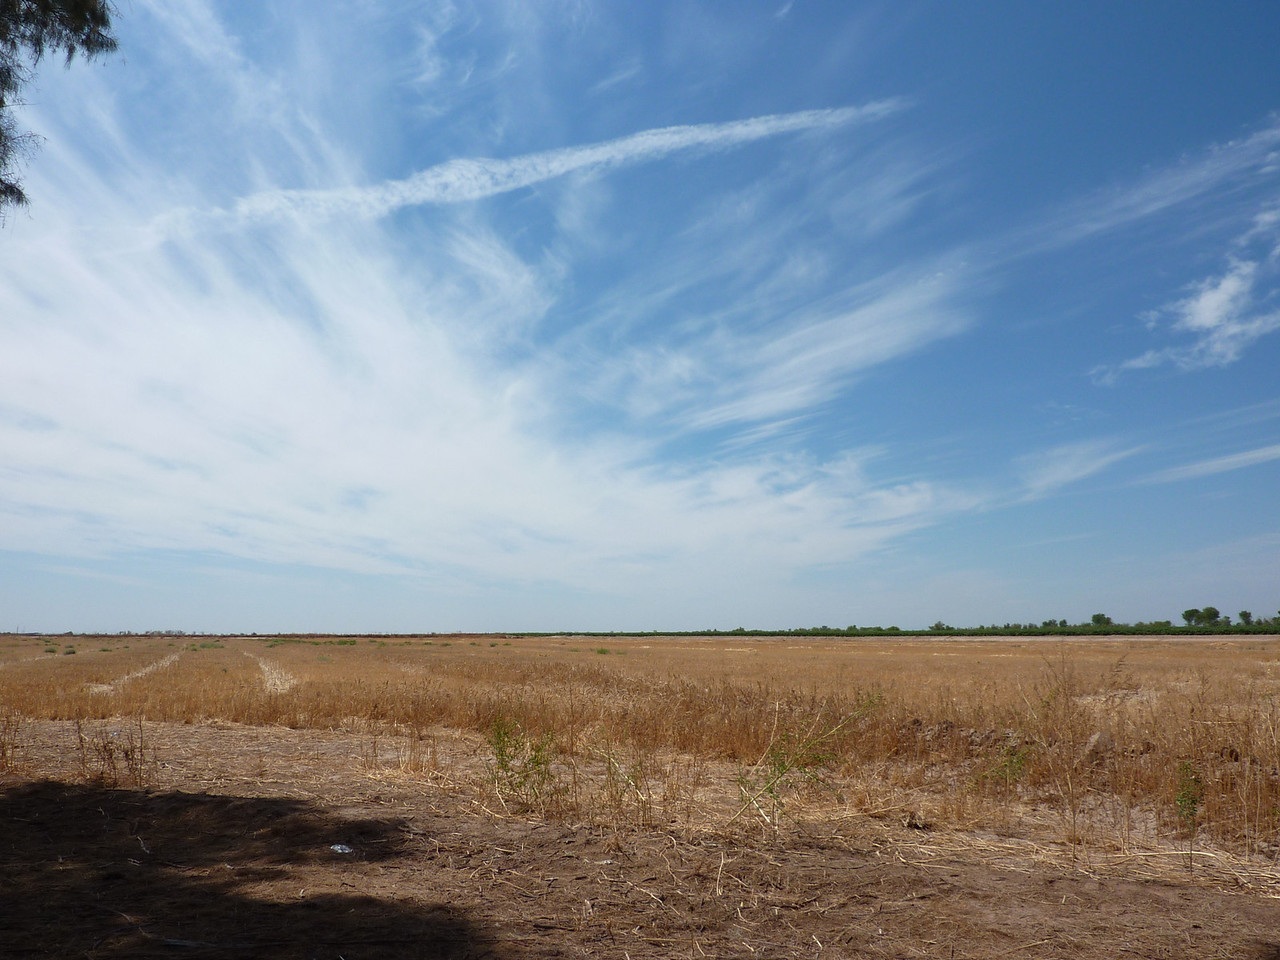 Cut grain field near the Arizona-Mexico border.